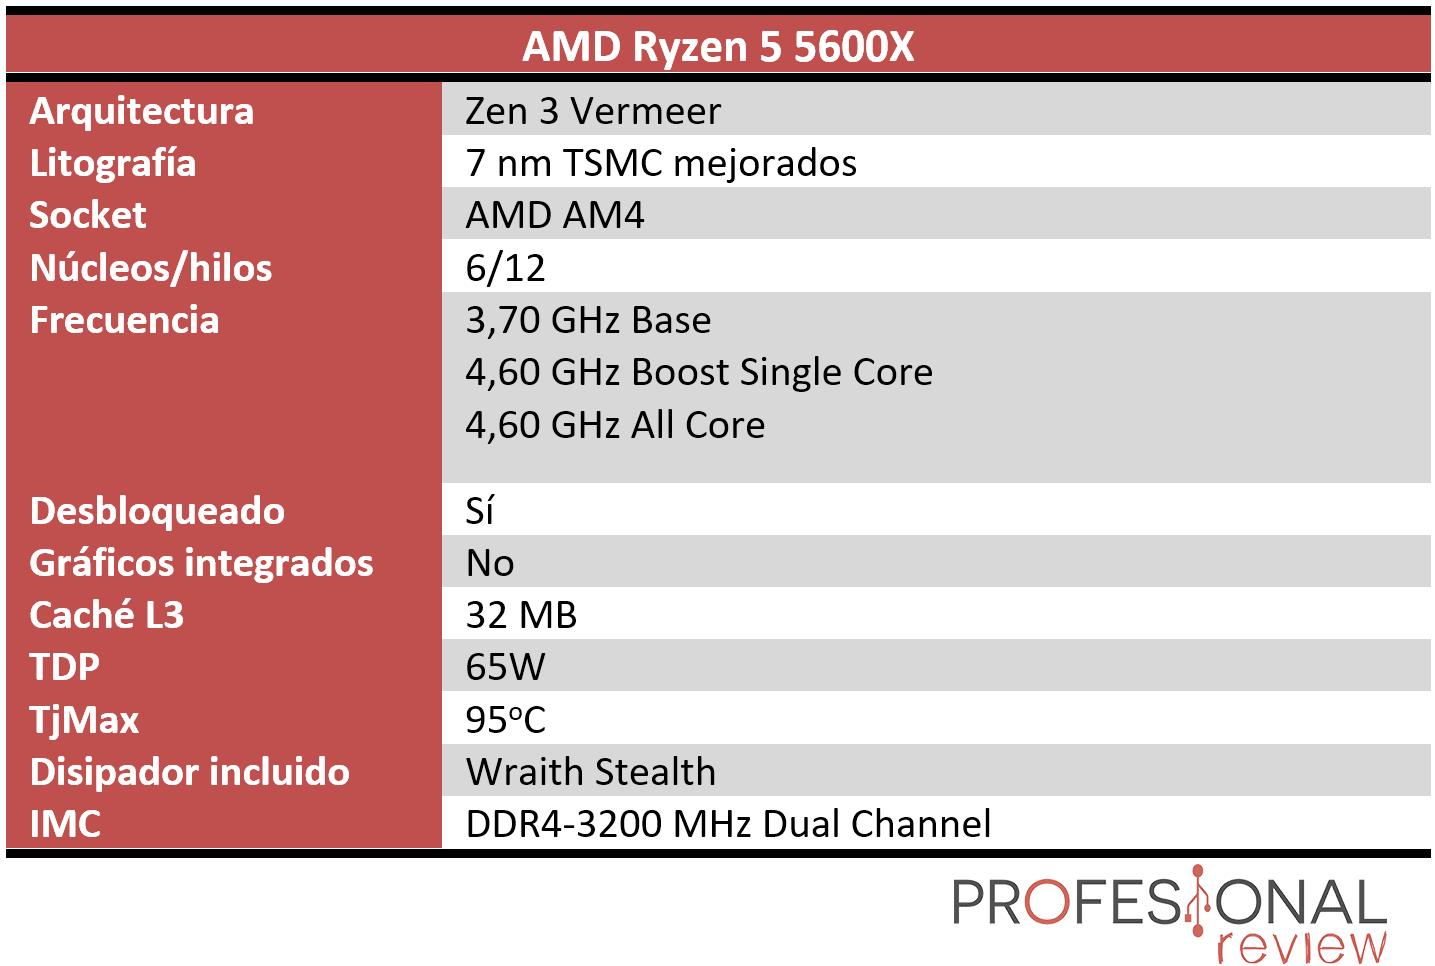 AMD Ryzen 5 5600X Características